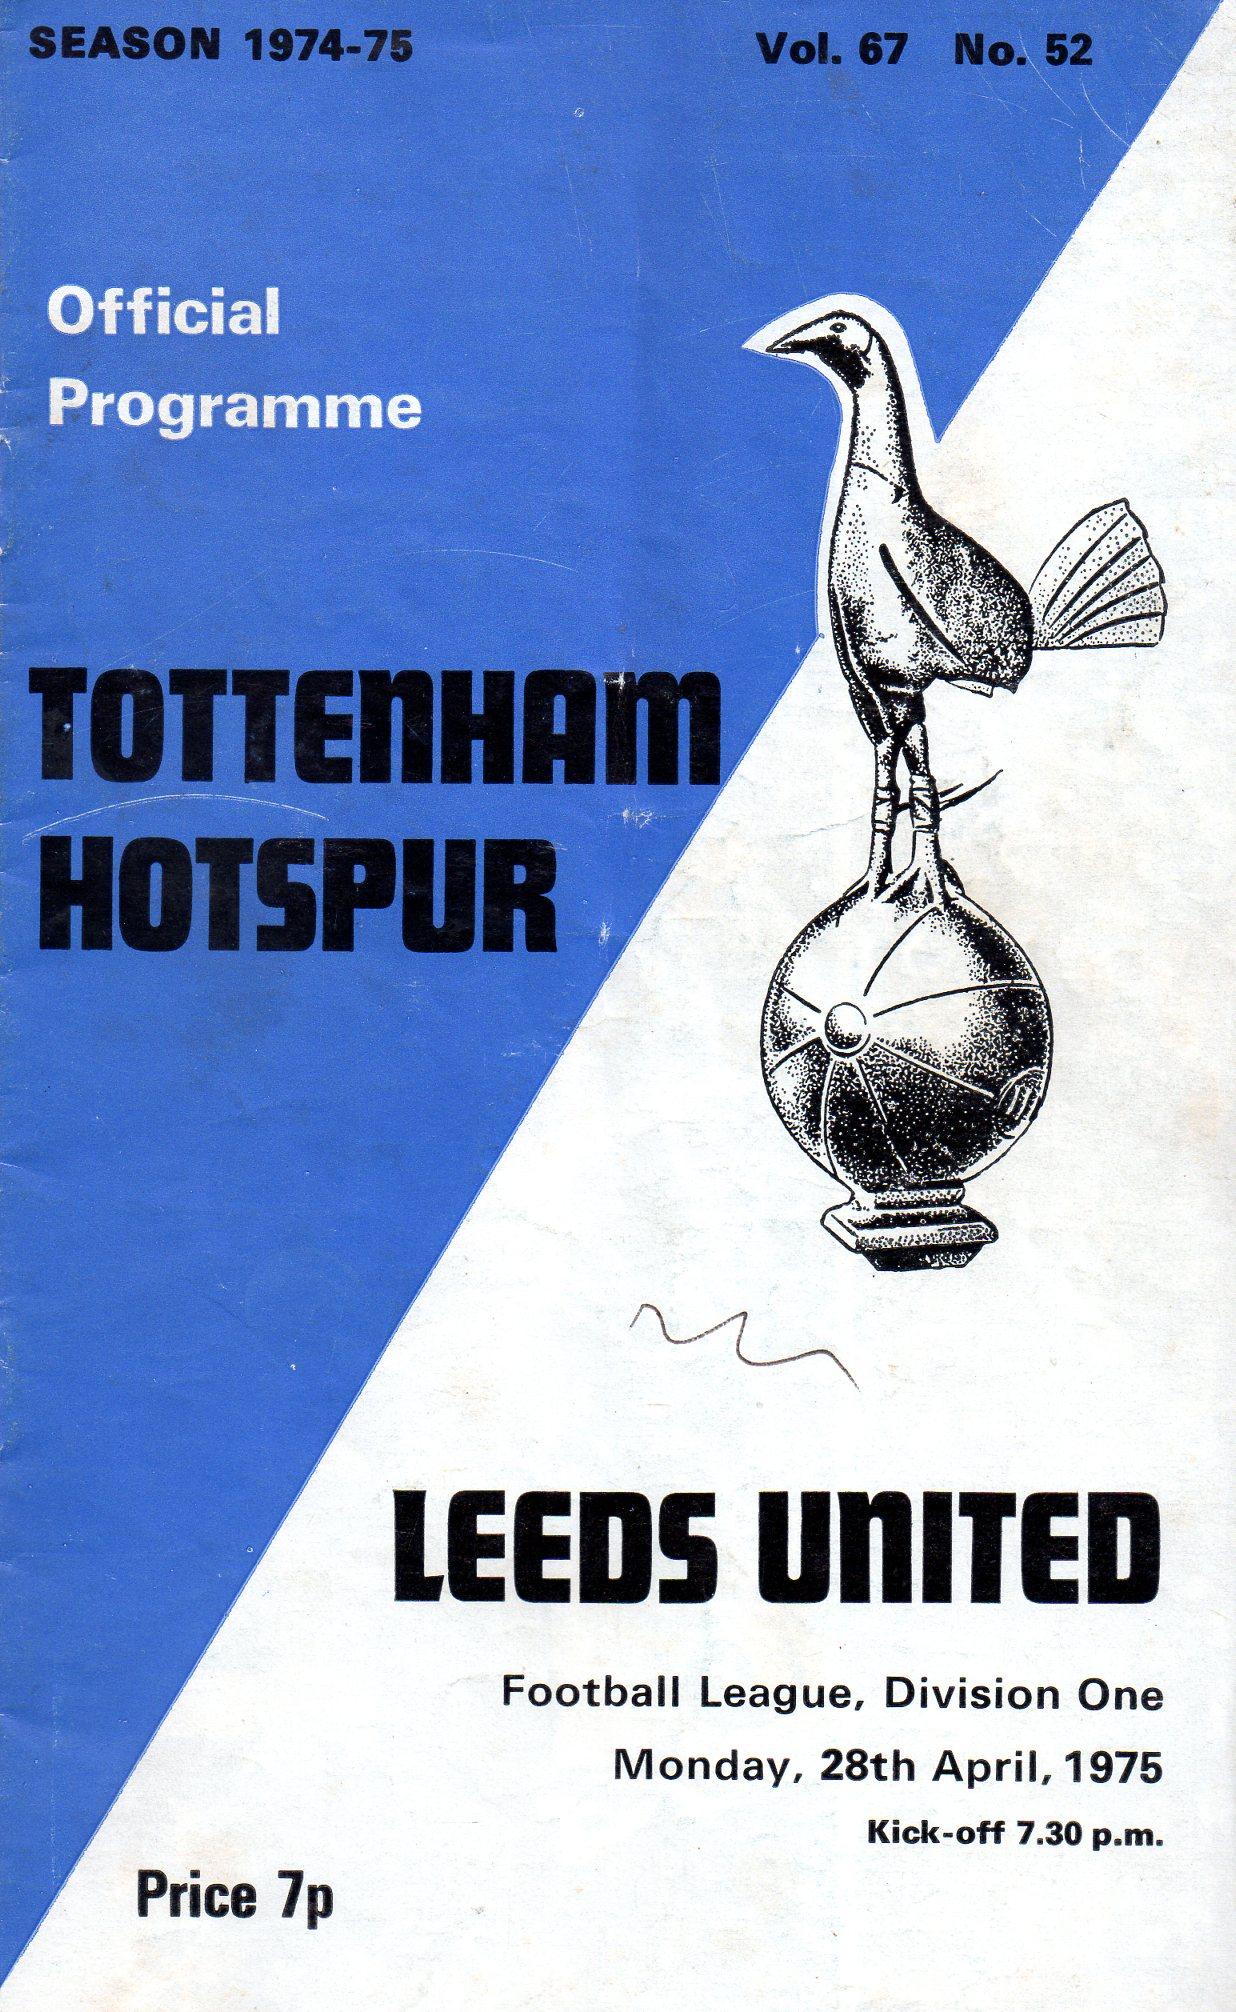 1974/5 : Spurs Programmes, The home of Tottenham Hotspur